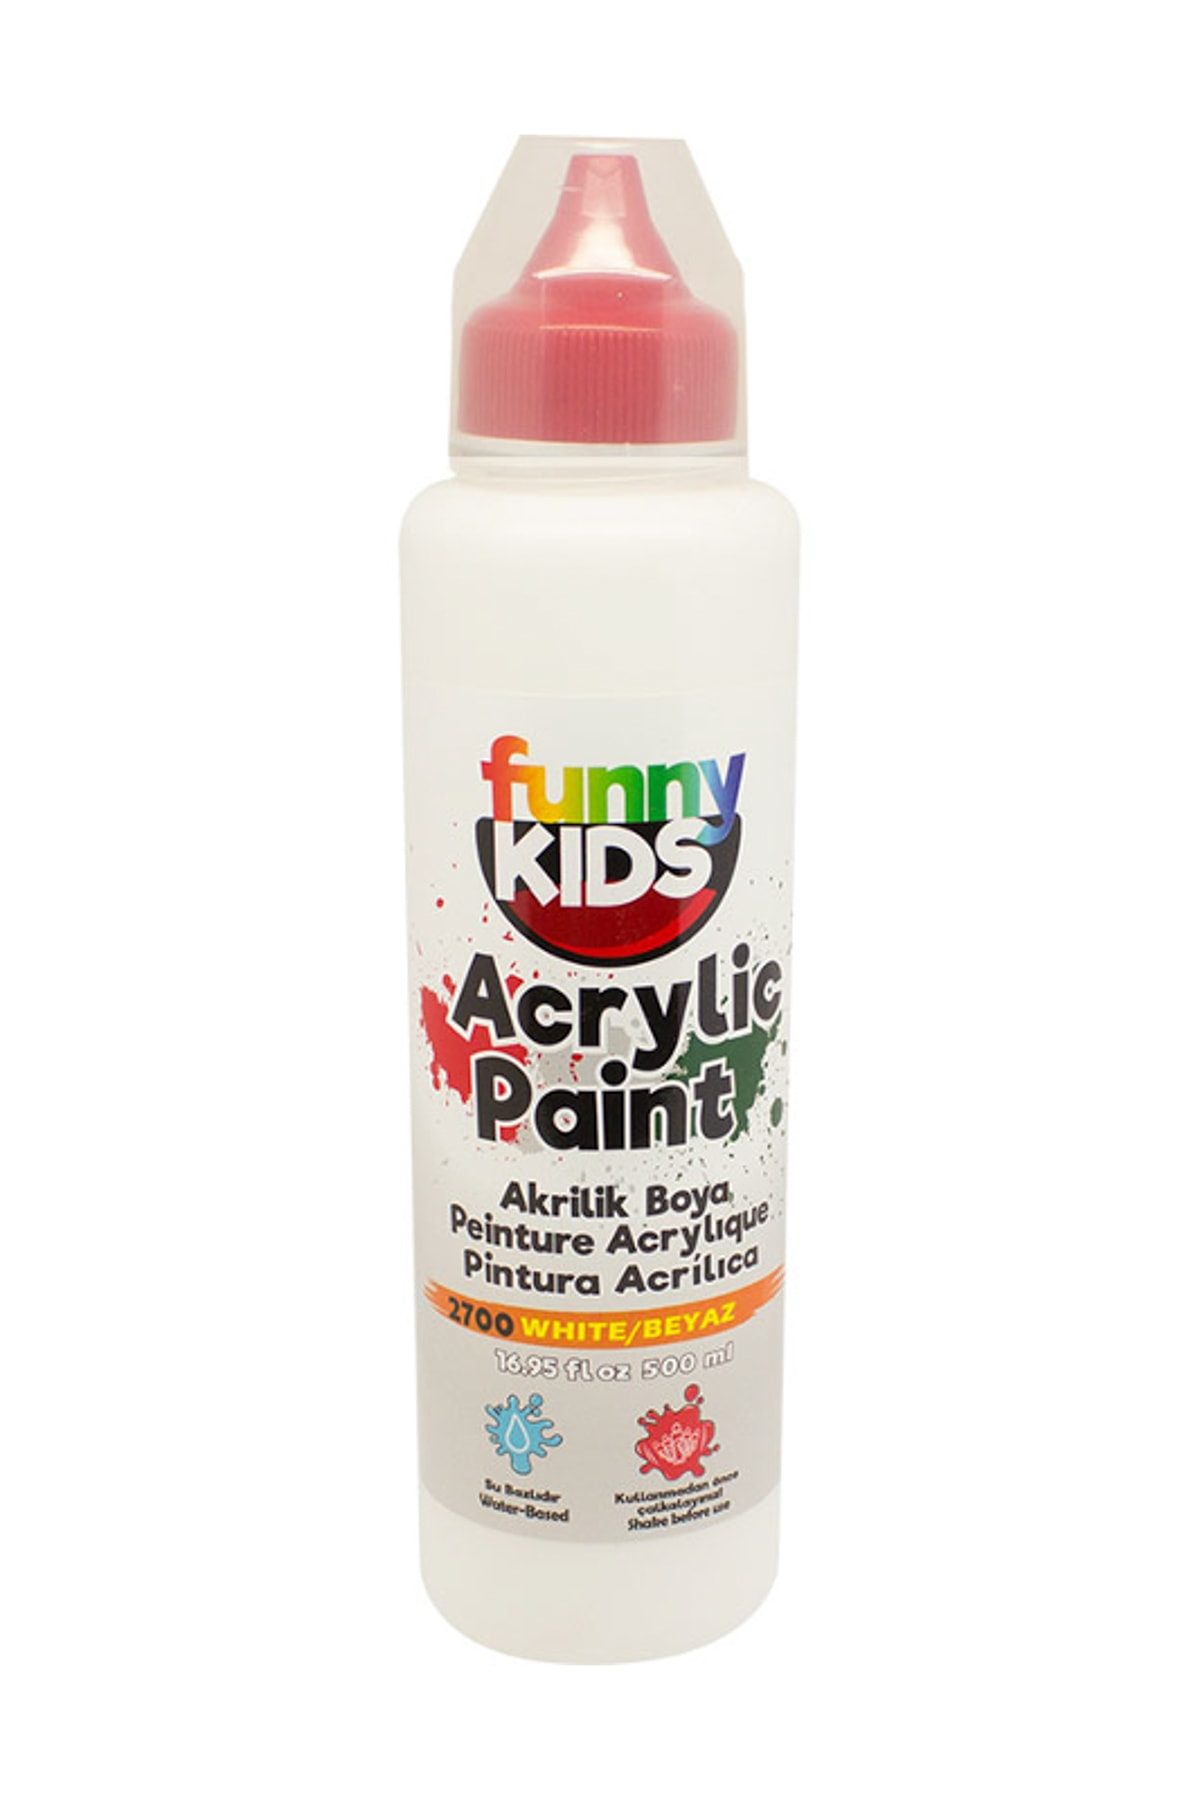 Rich Funny Kids Akrilik Boya 500ml - 2700 Beyaz 1